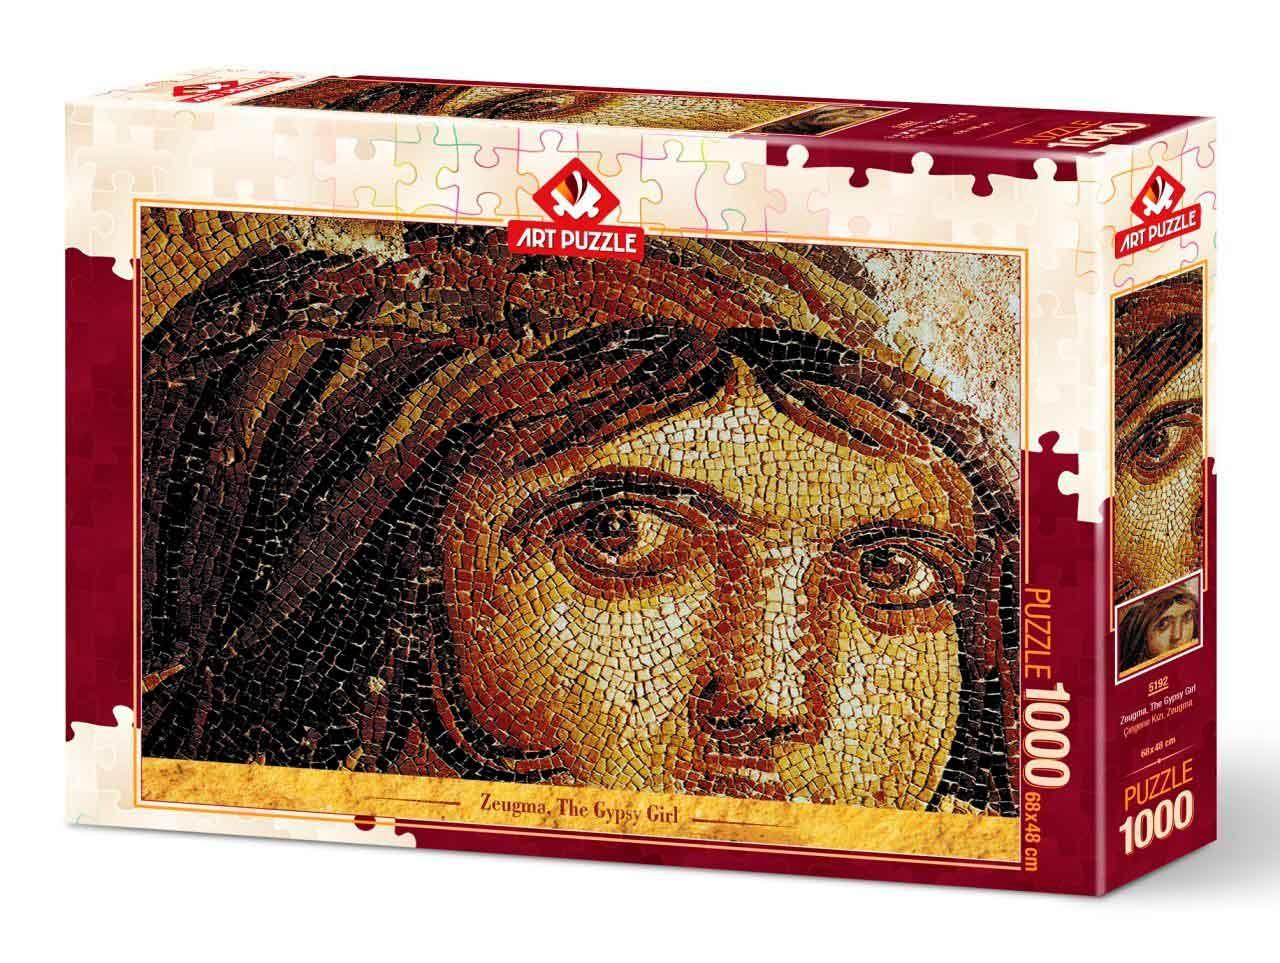 Puzzle Art Puzzle Zeugma, La Chica Gitana de 1000 Piezas